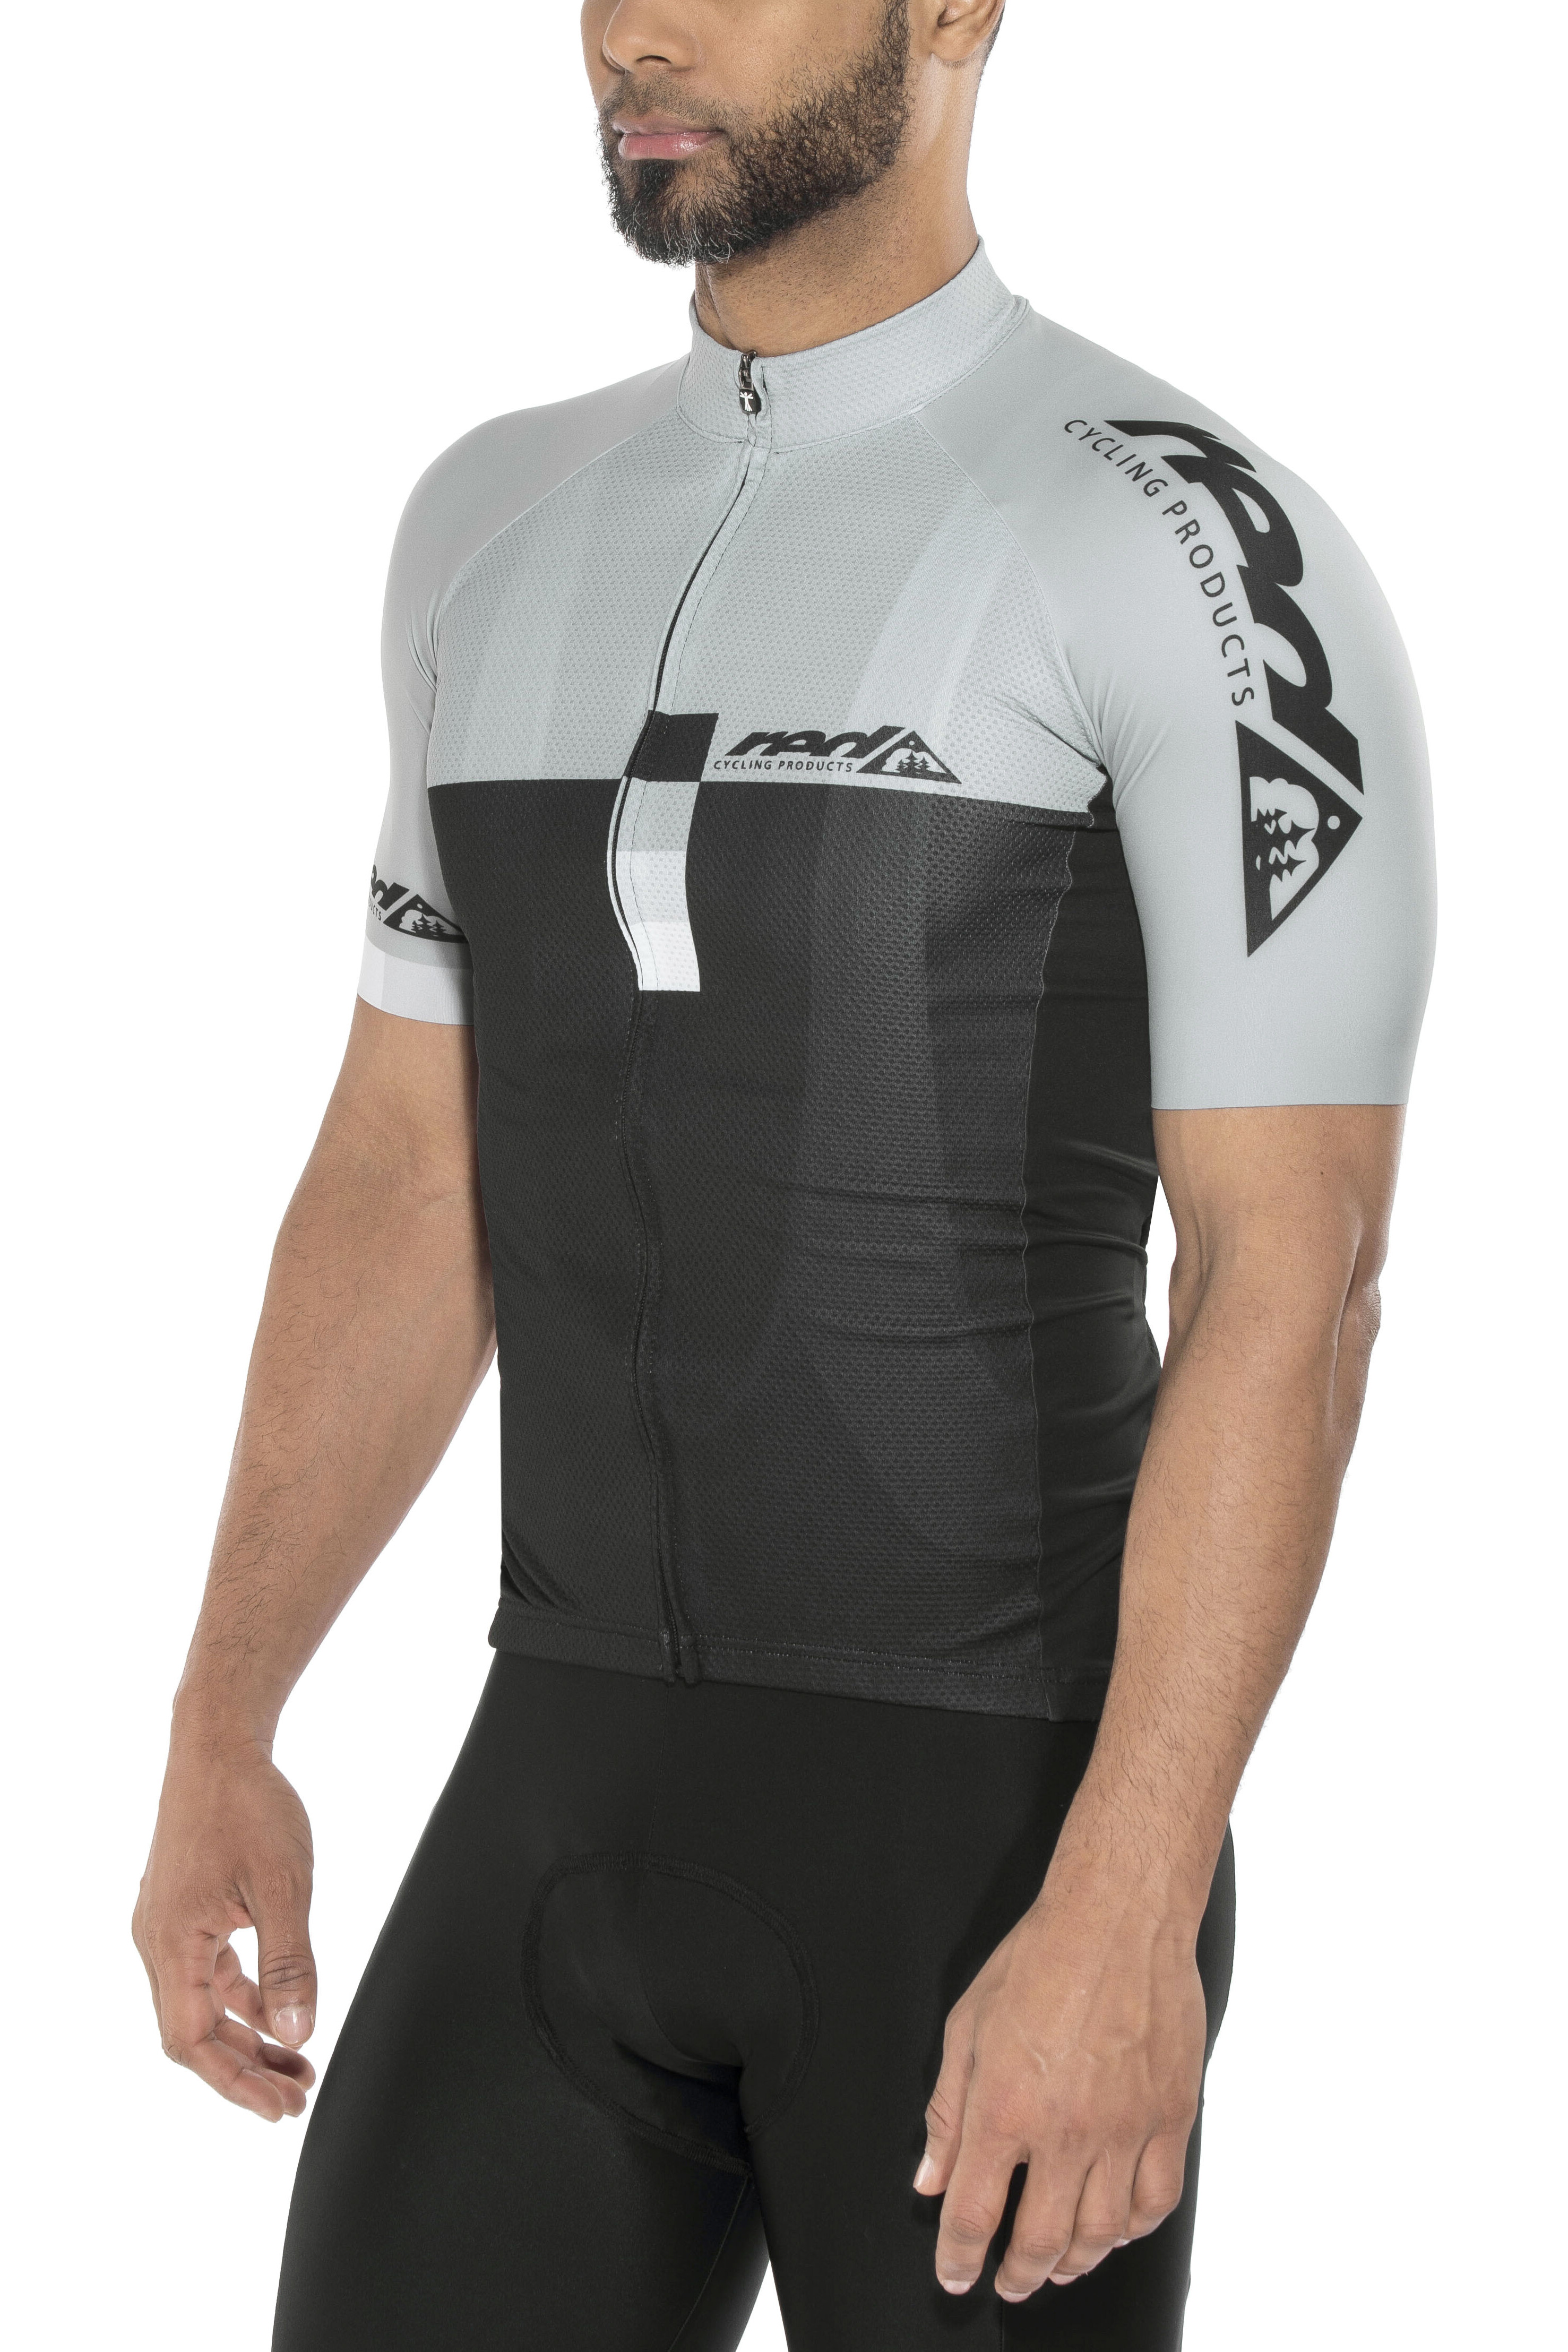 e5372a90096 Red Cycling Products Pro Race Bike Jersey Shortsleeve Men grey black ...